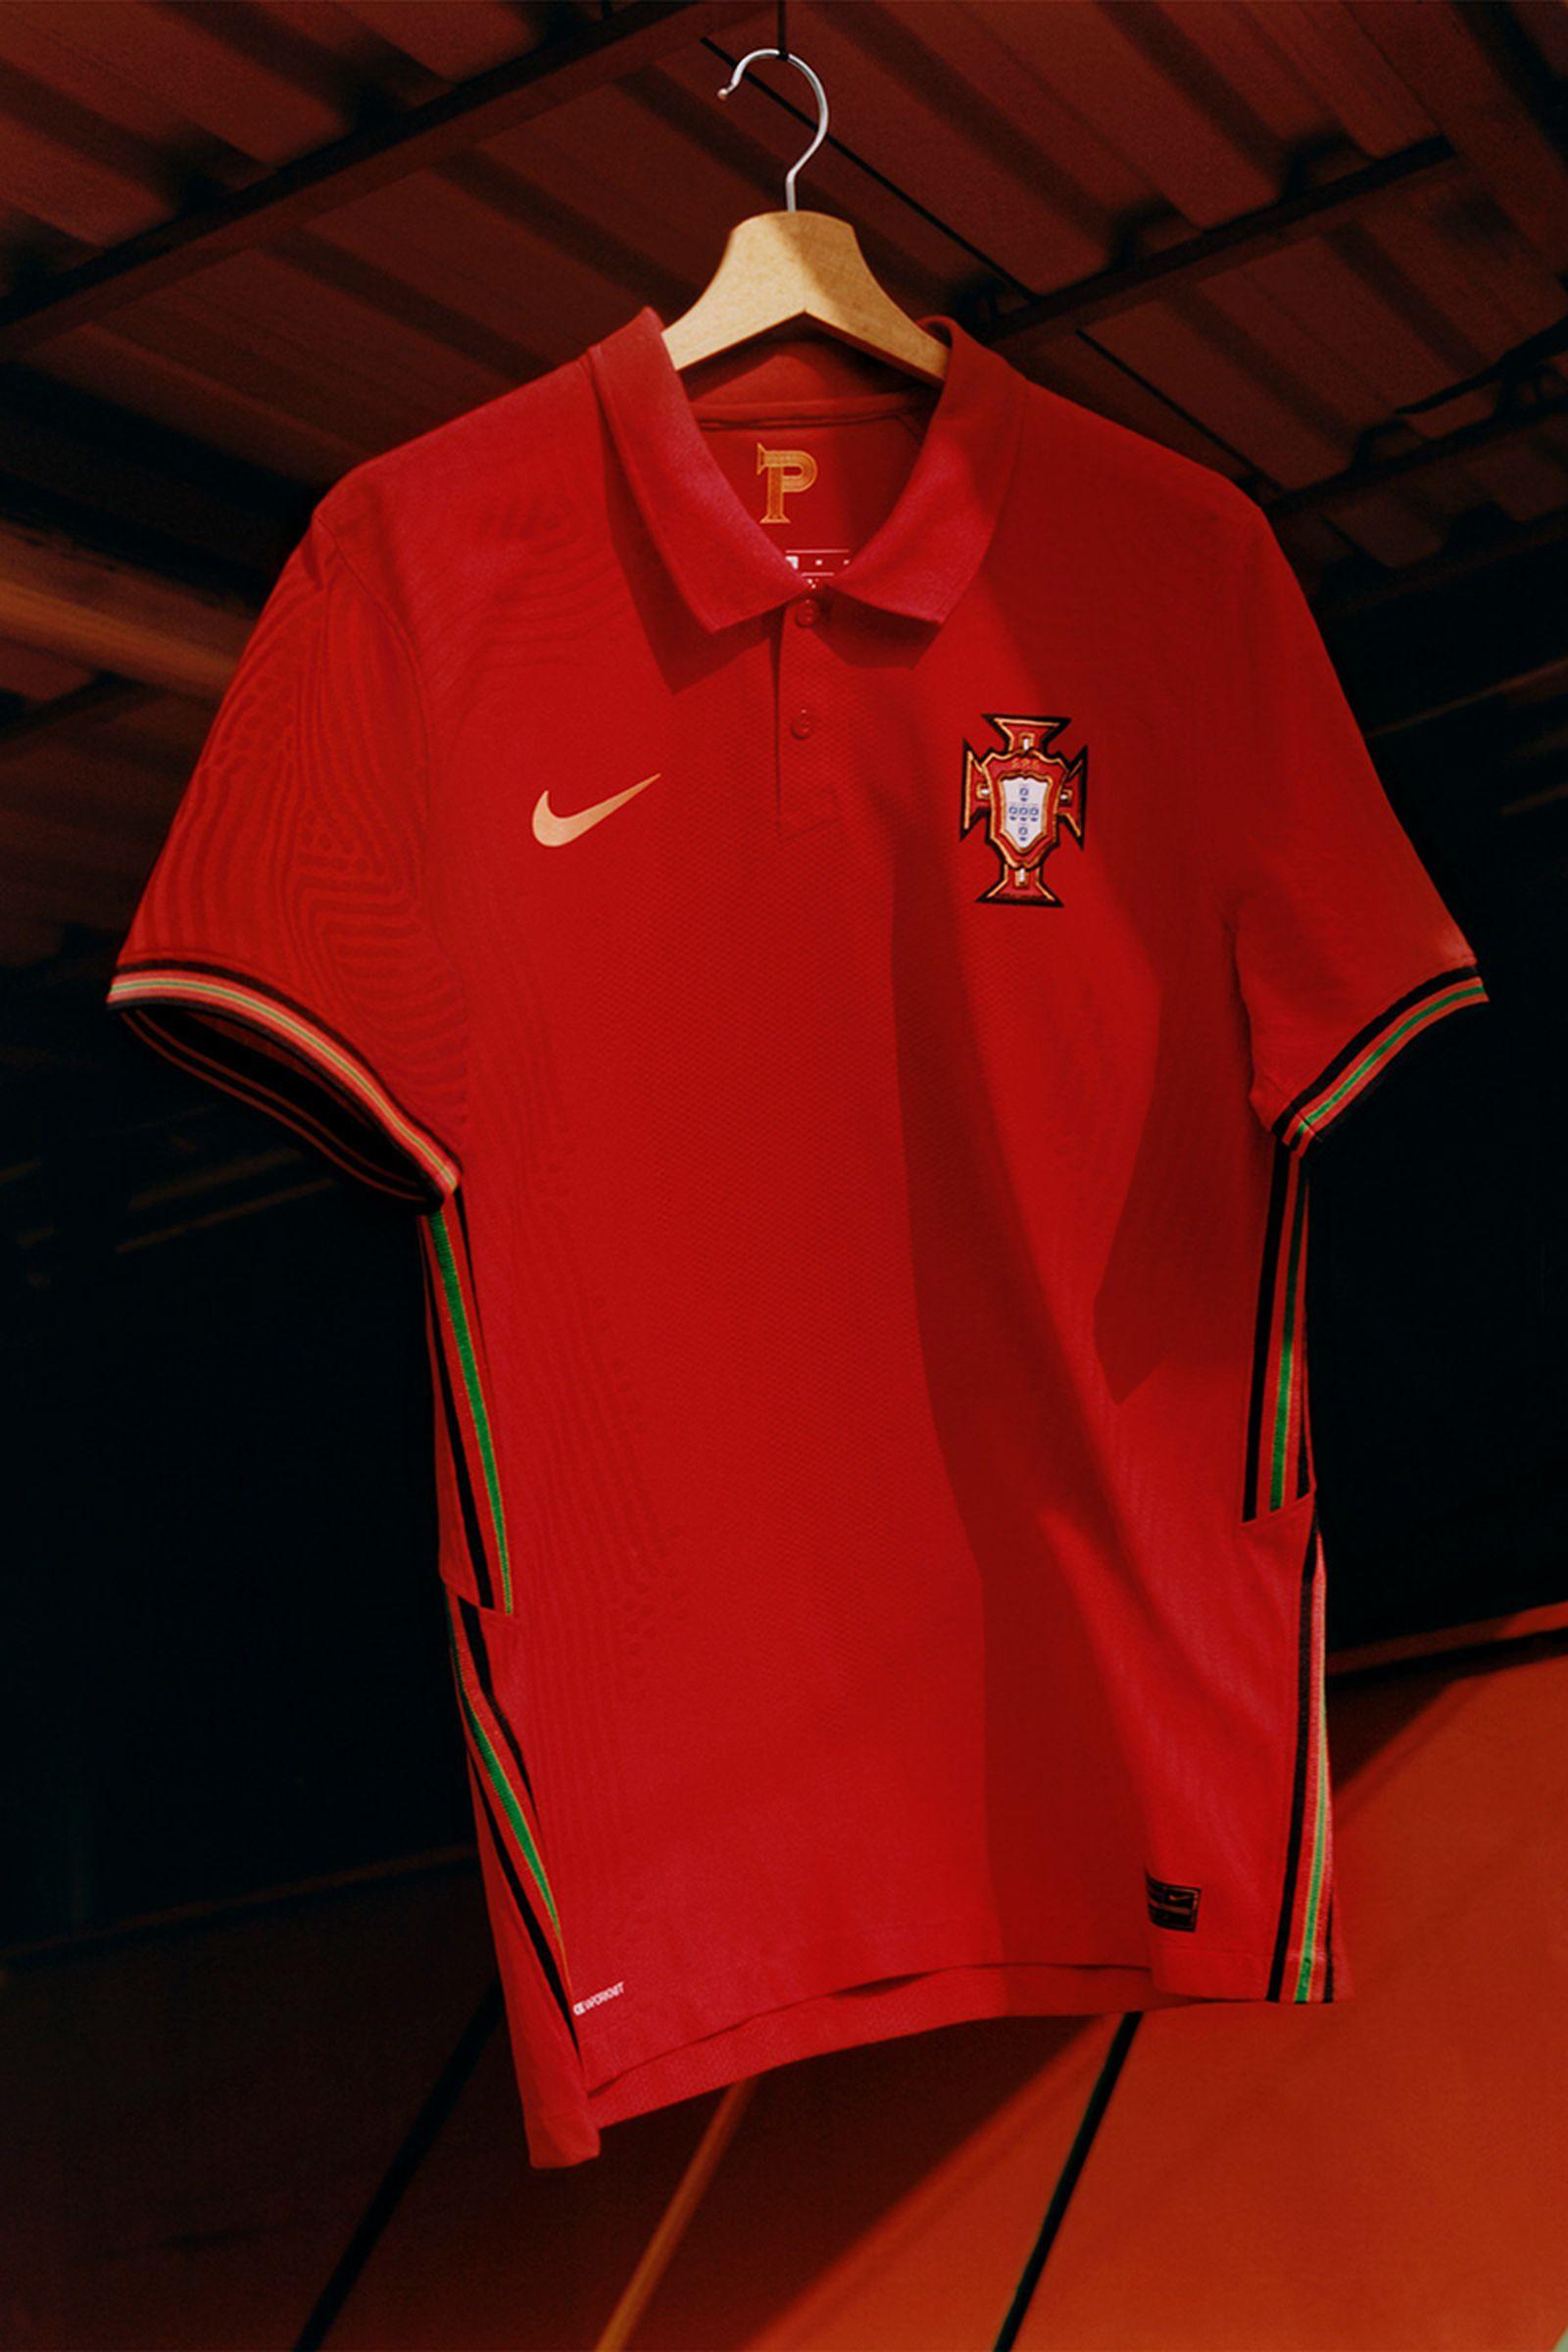 nike-national-team-kits-2020-ranking-05